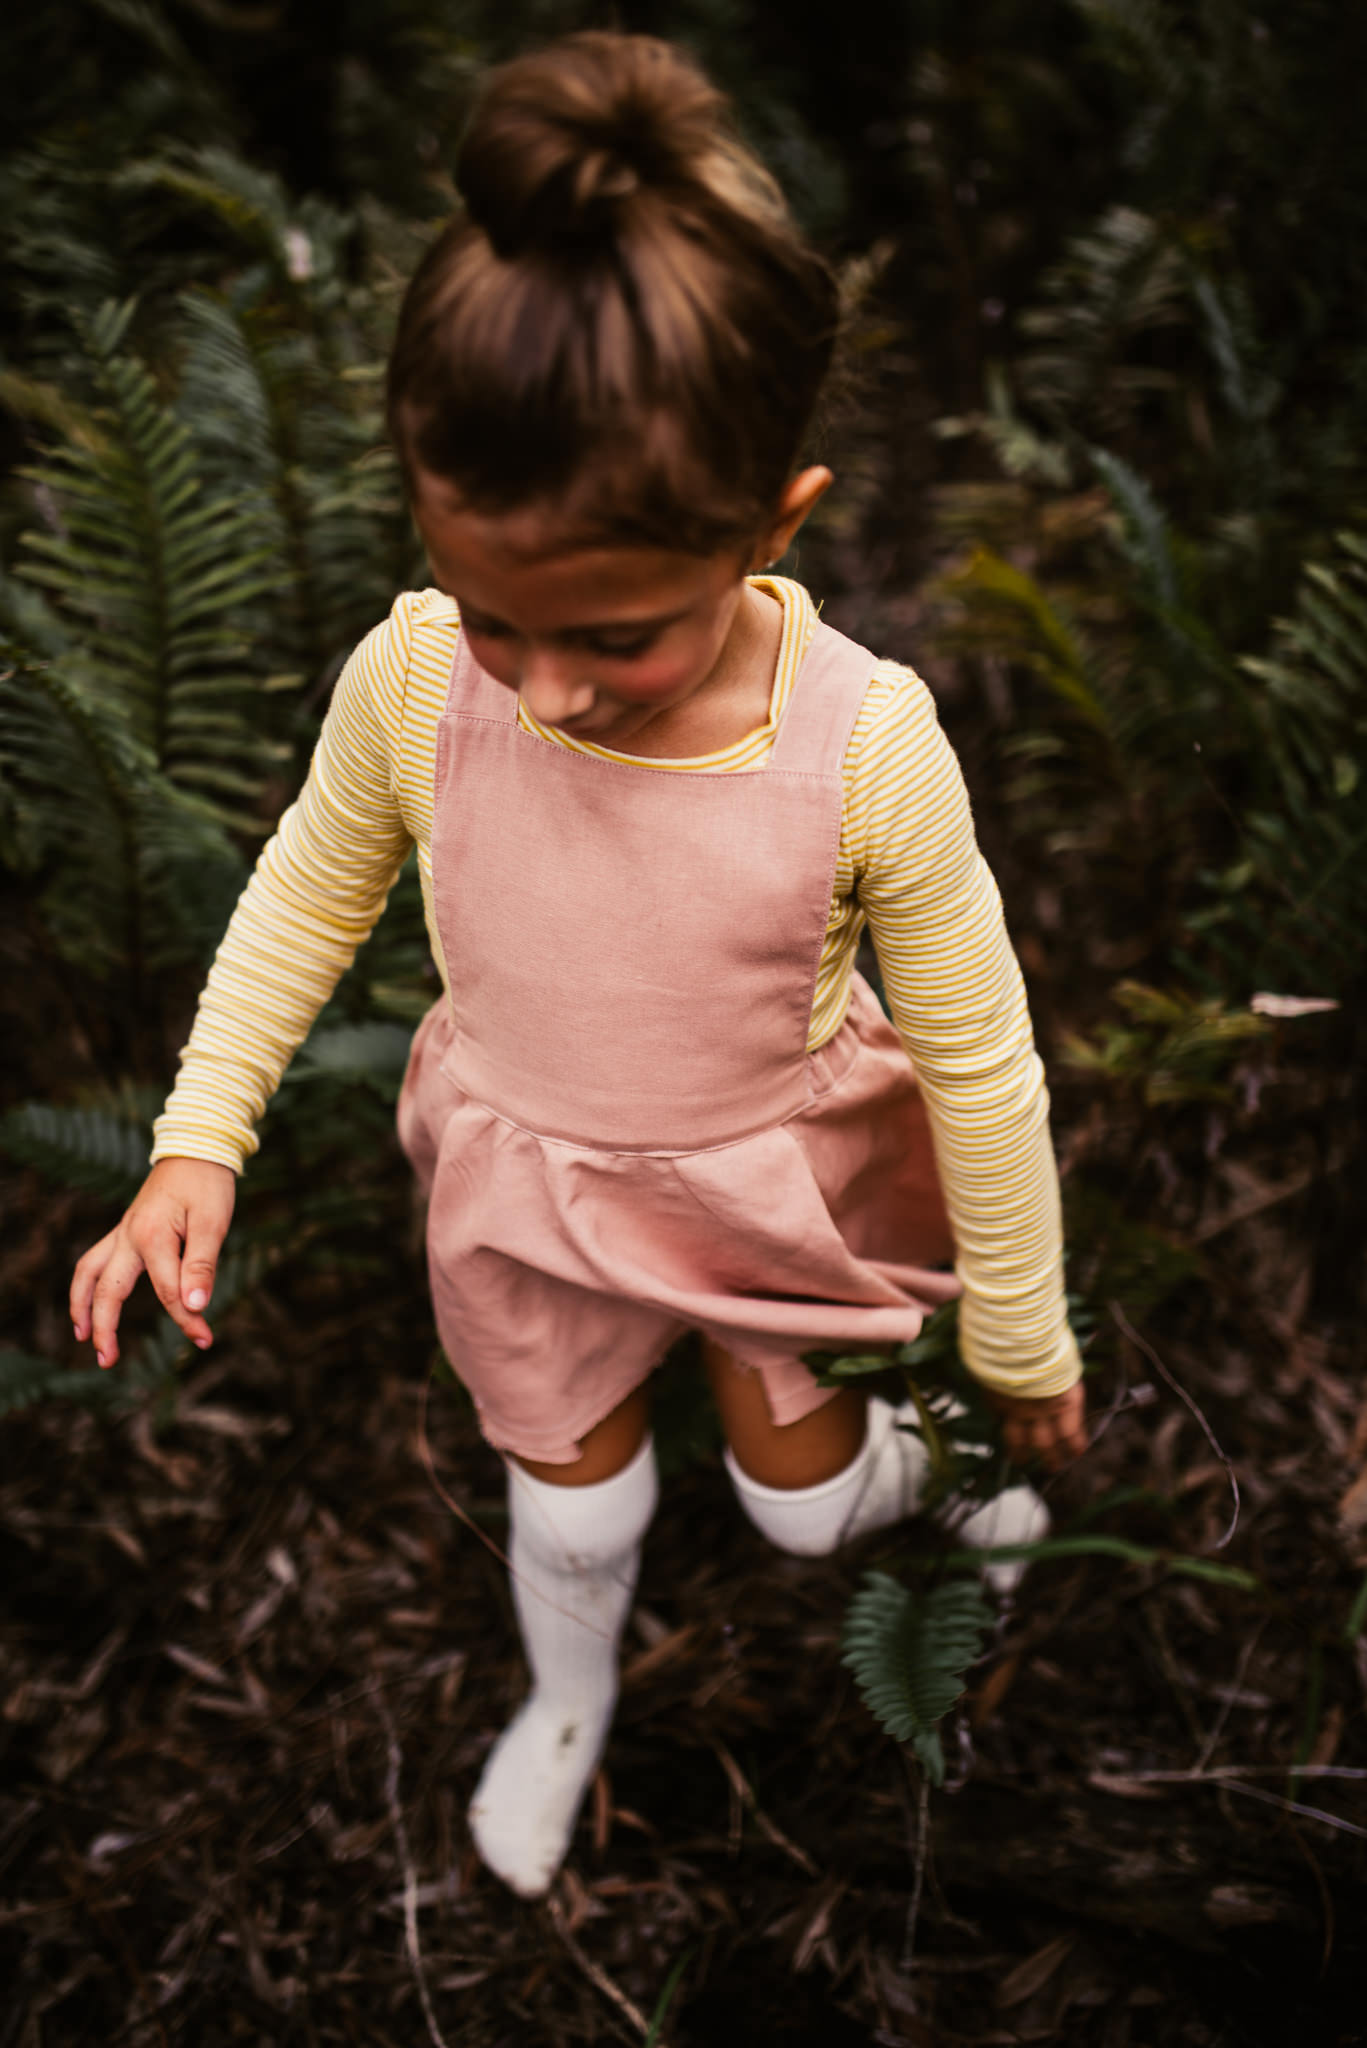 twyla jones photography - treasure coast florida - childrens adventure clothing commercial shoot--24.jpg